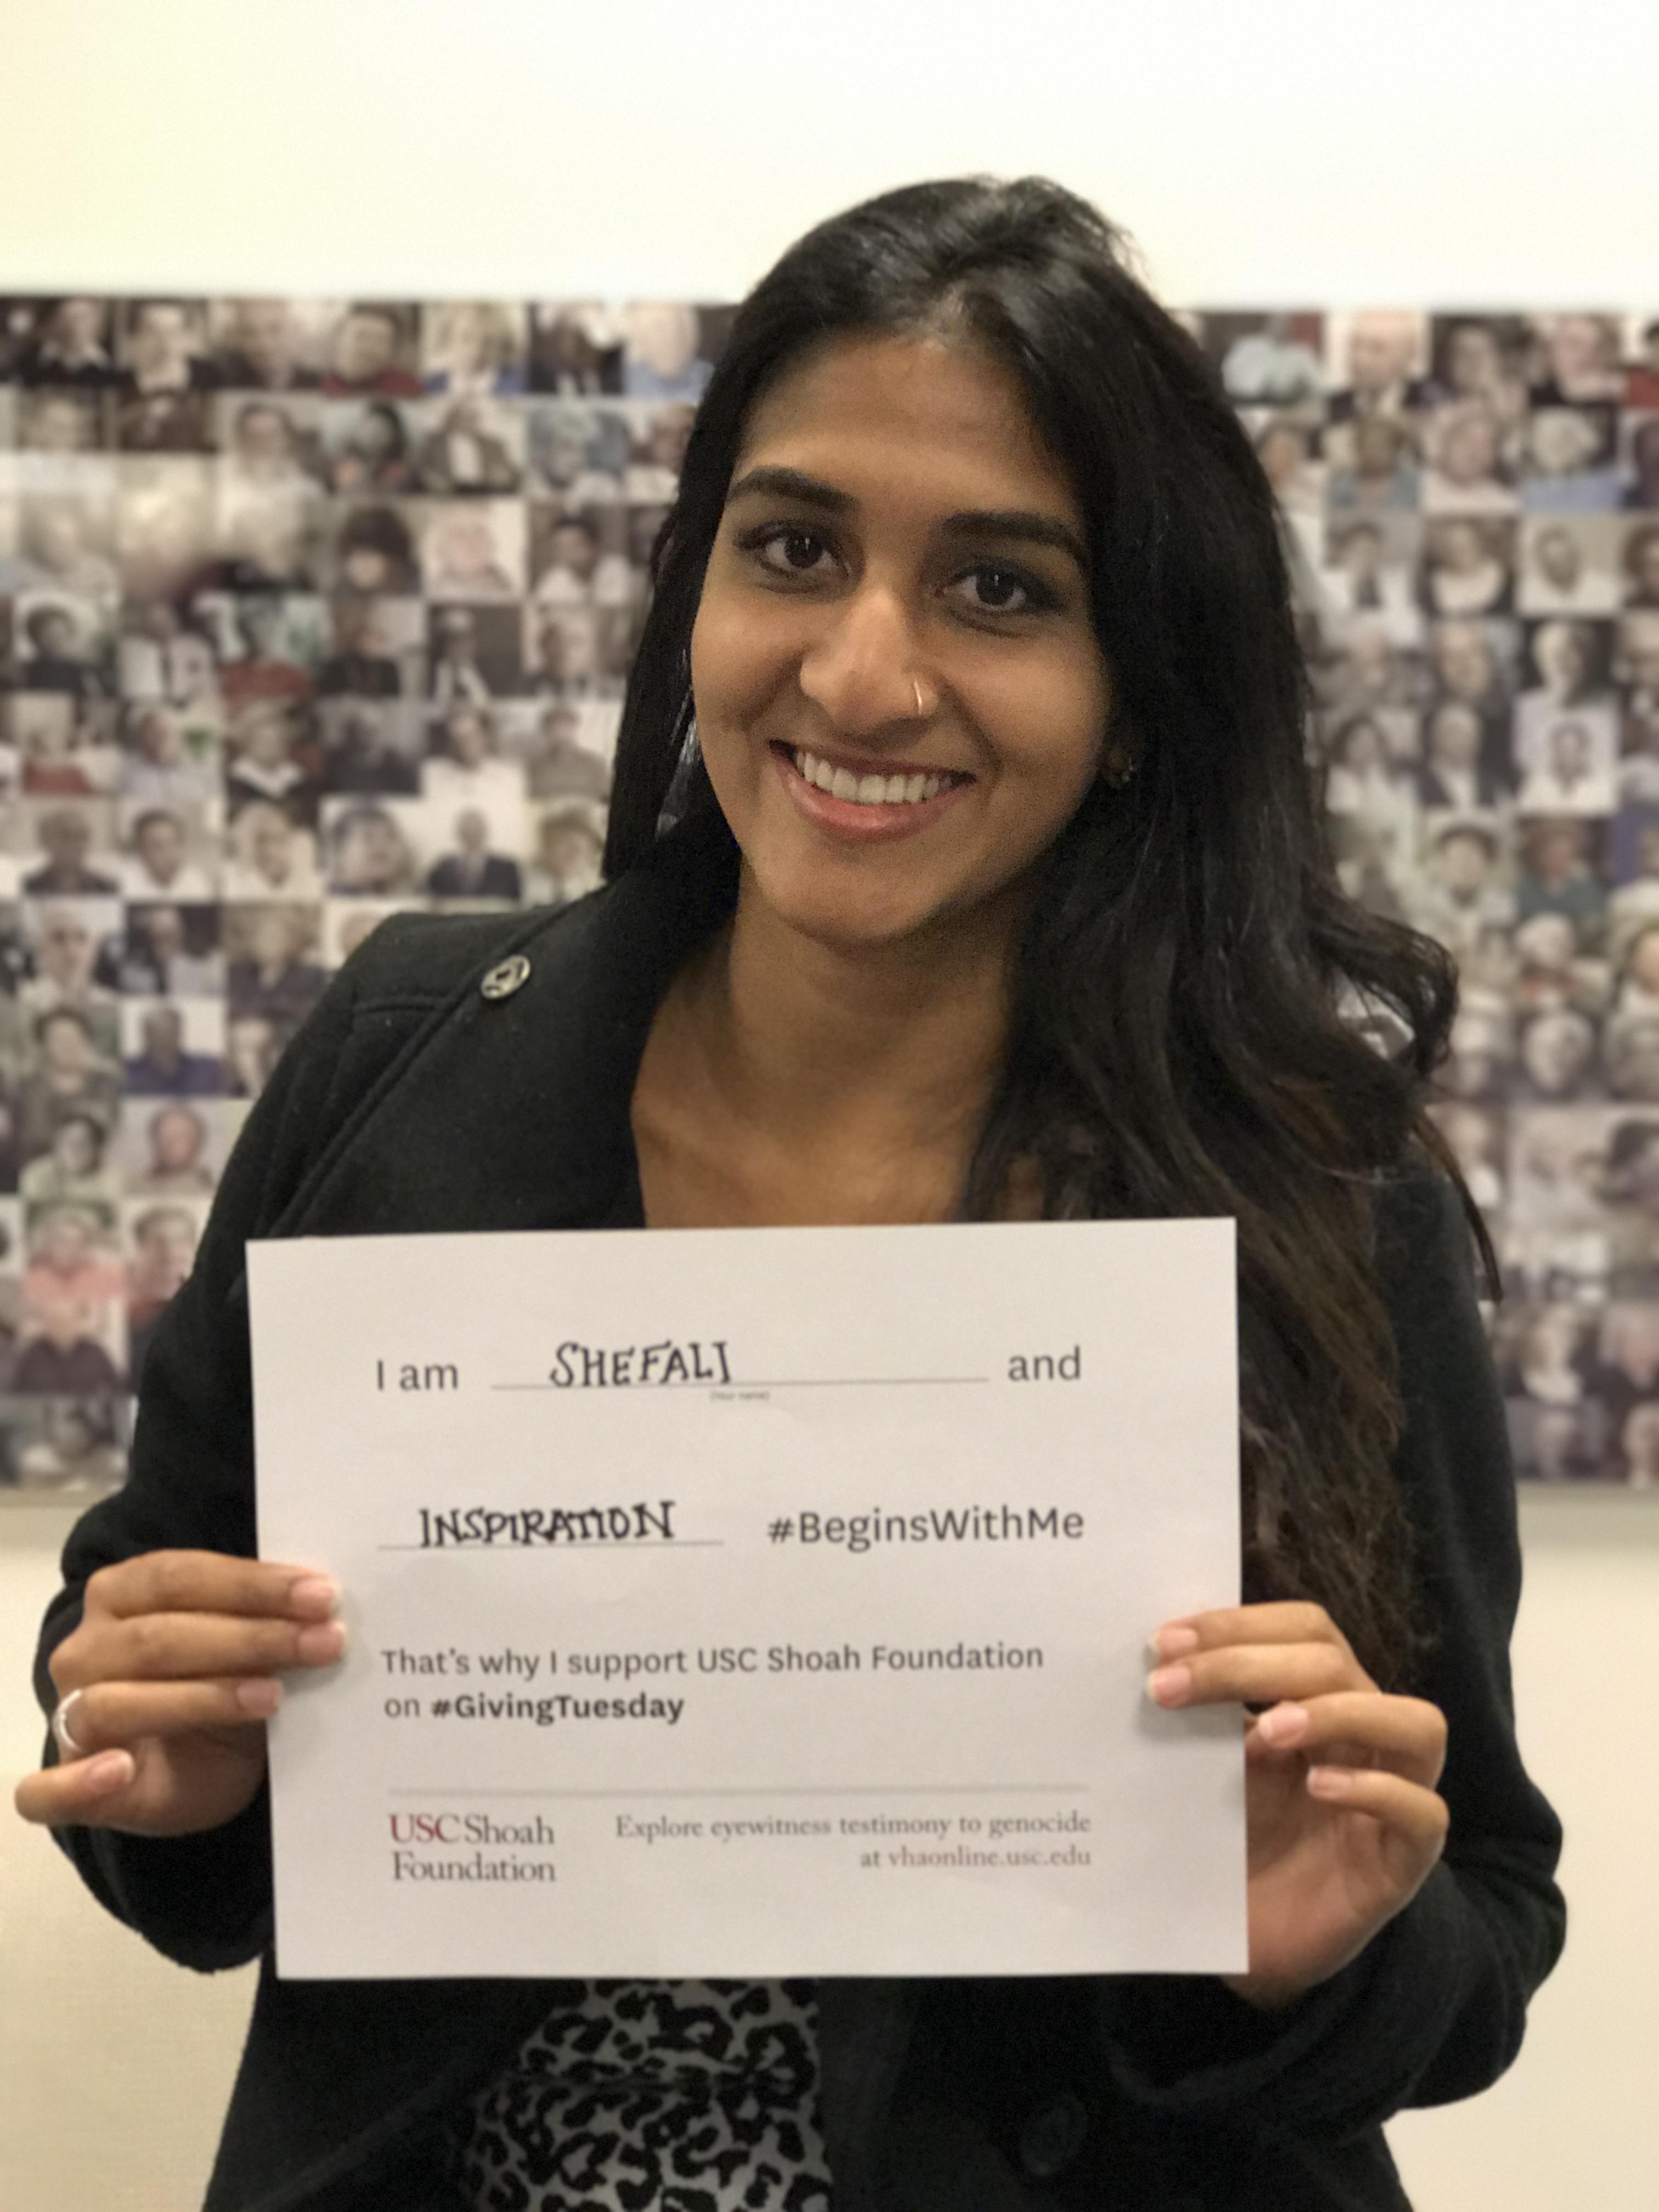 Shefali Deshpande - Inspiration #BeginsWithMe